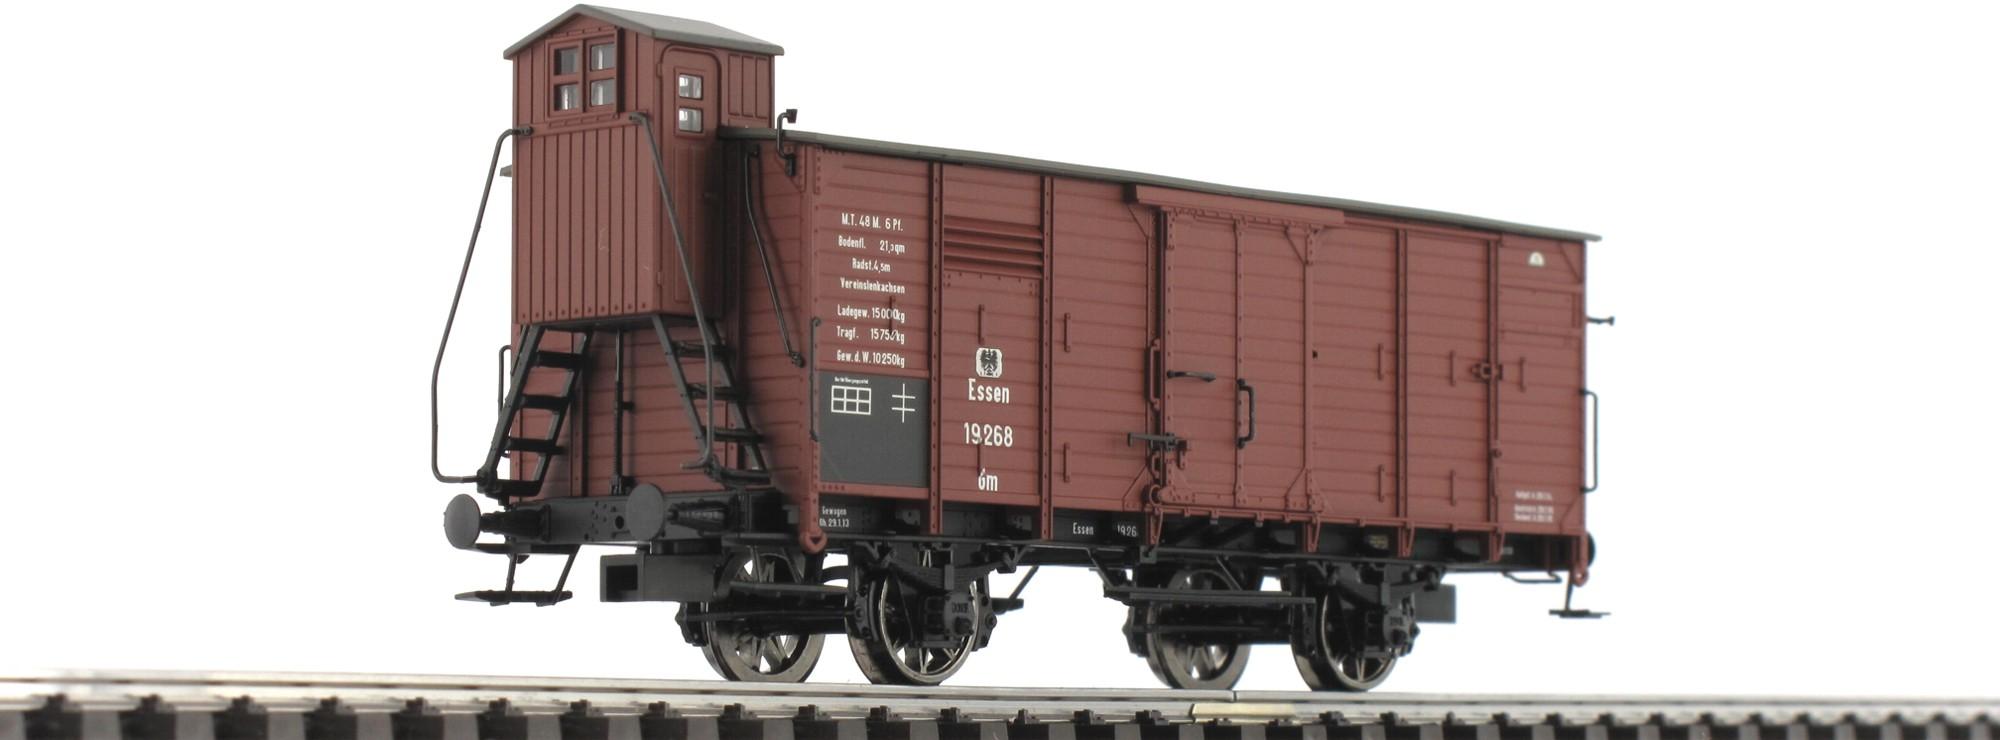 BRAWA H0 48285 Güterwagen G10 KaldeweI NEUWARE MESSEMODELL 2013